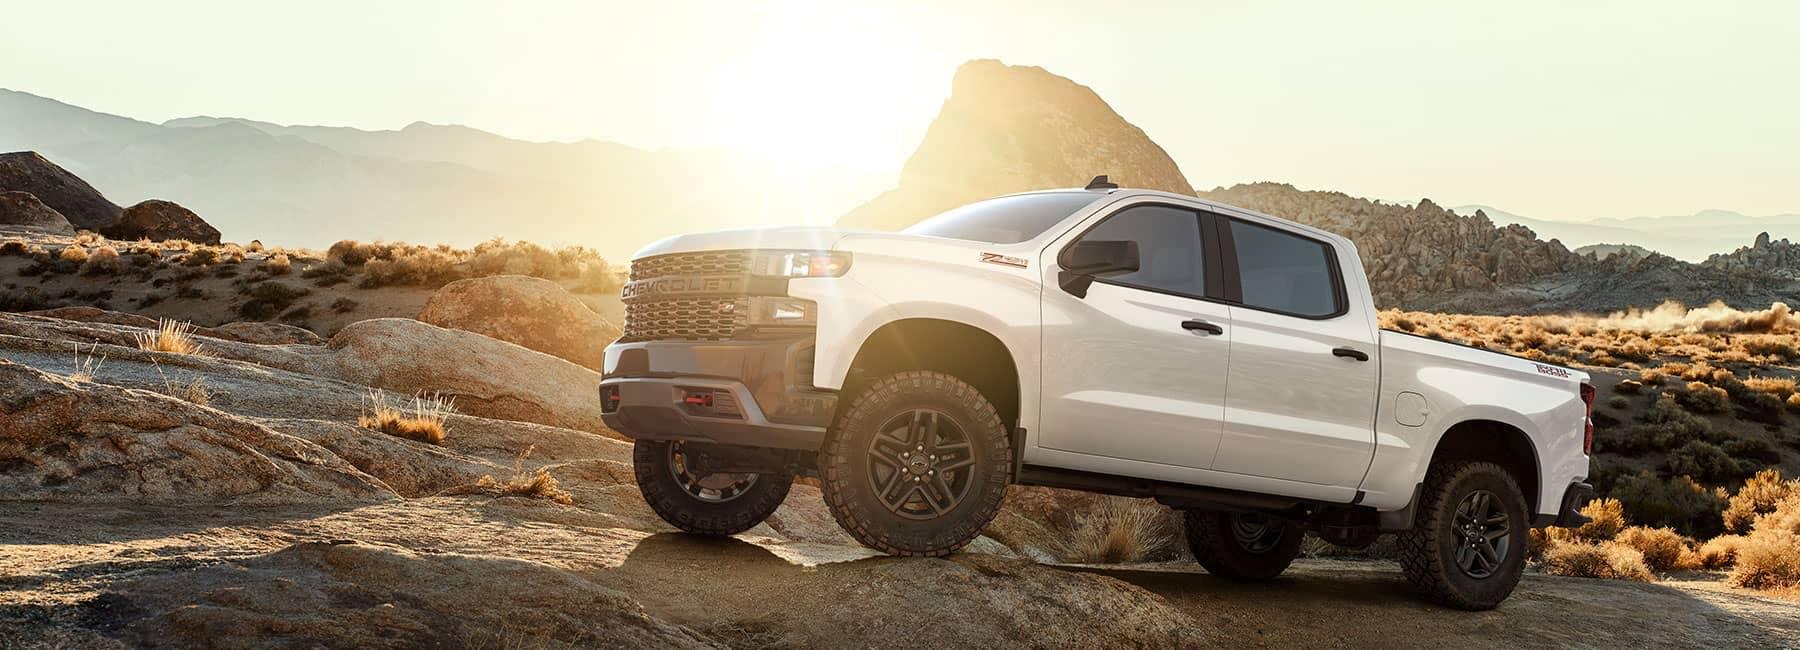 2019 White Chevrolet Truck